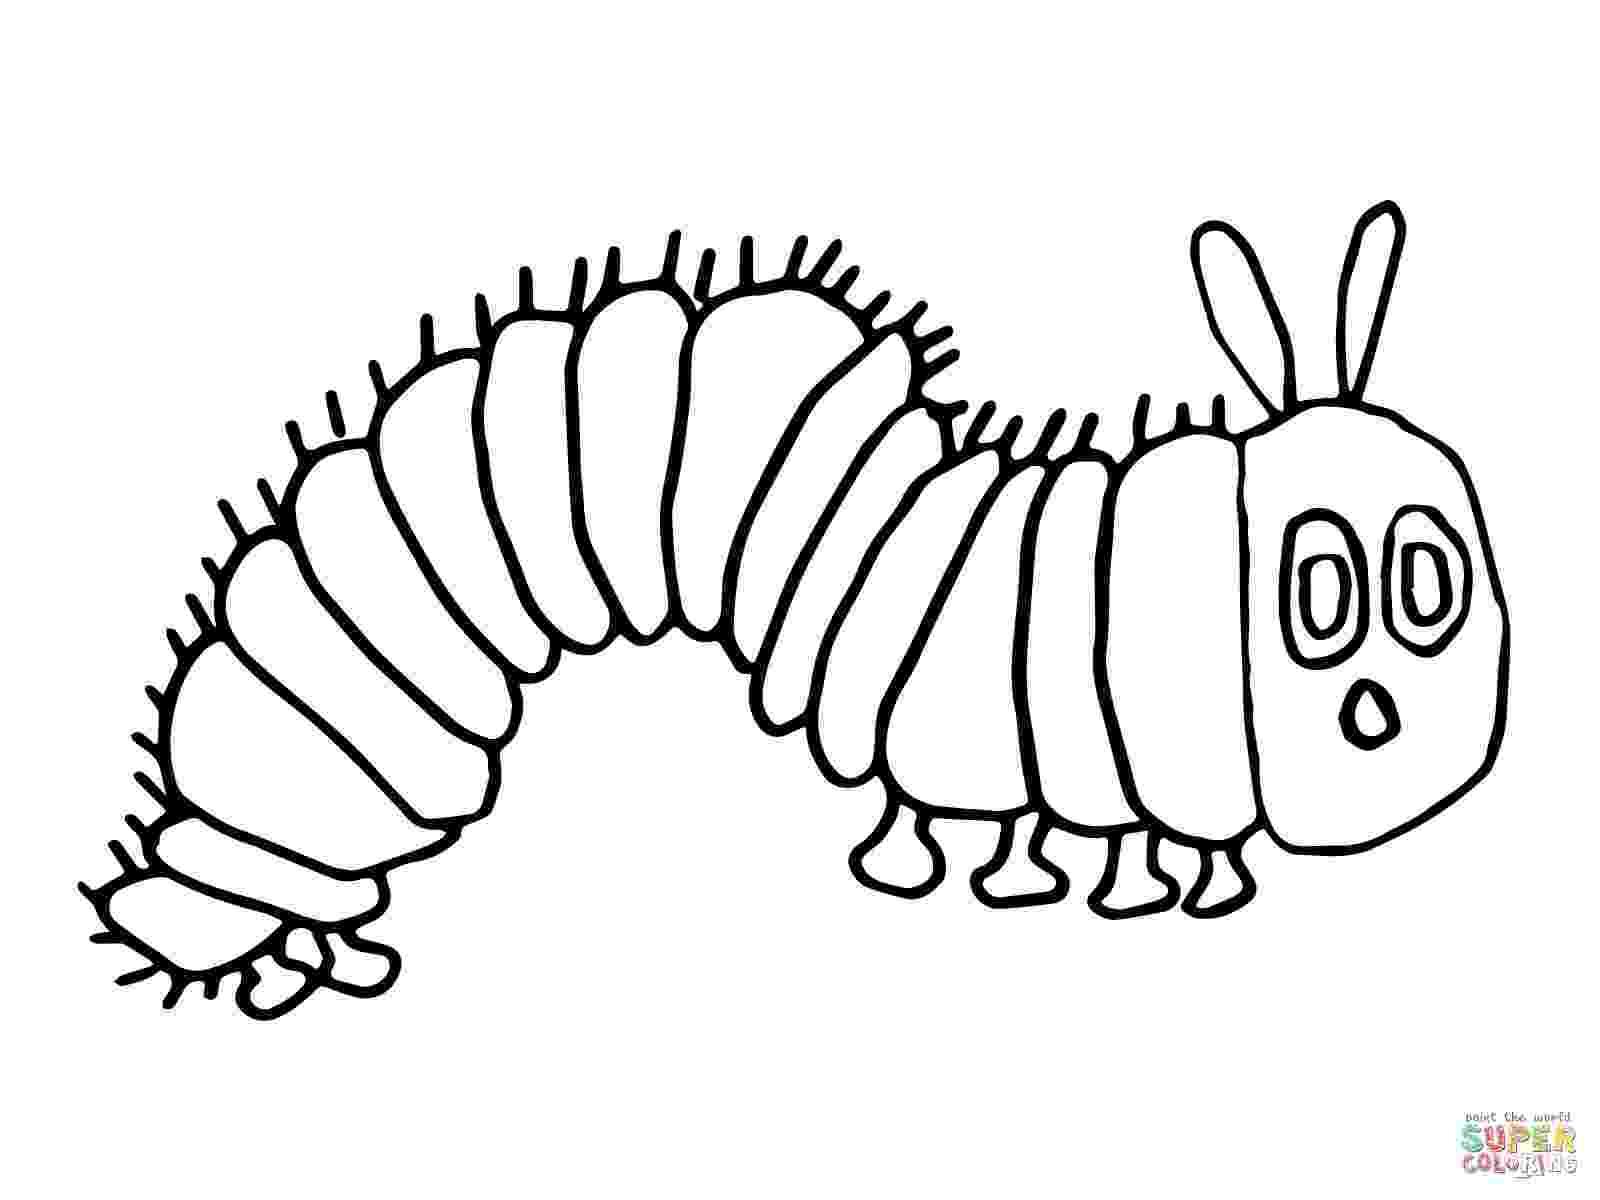 caterpillar for coloring printable caterpillar coloring pages for kids cool2bkids caterpillar for coloring 1 2